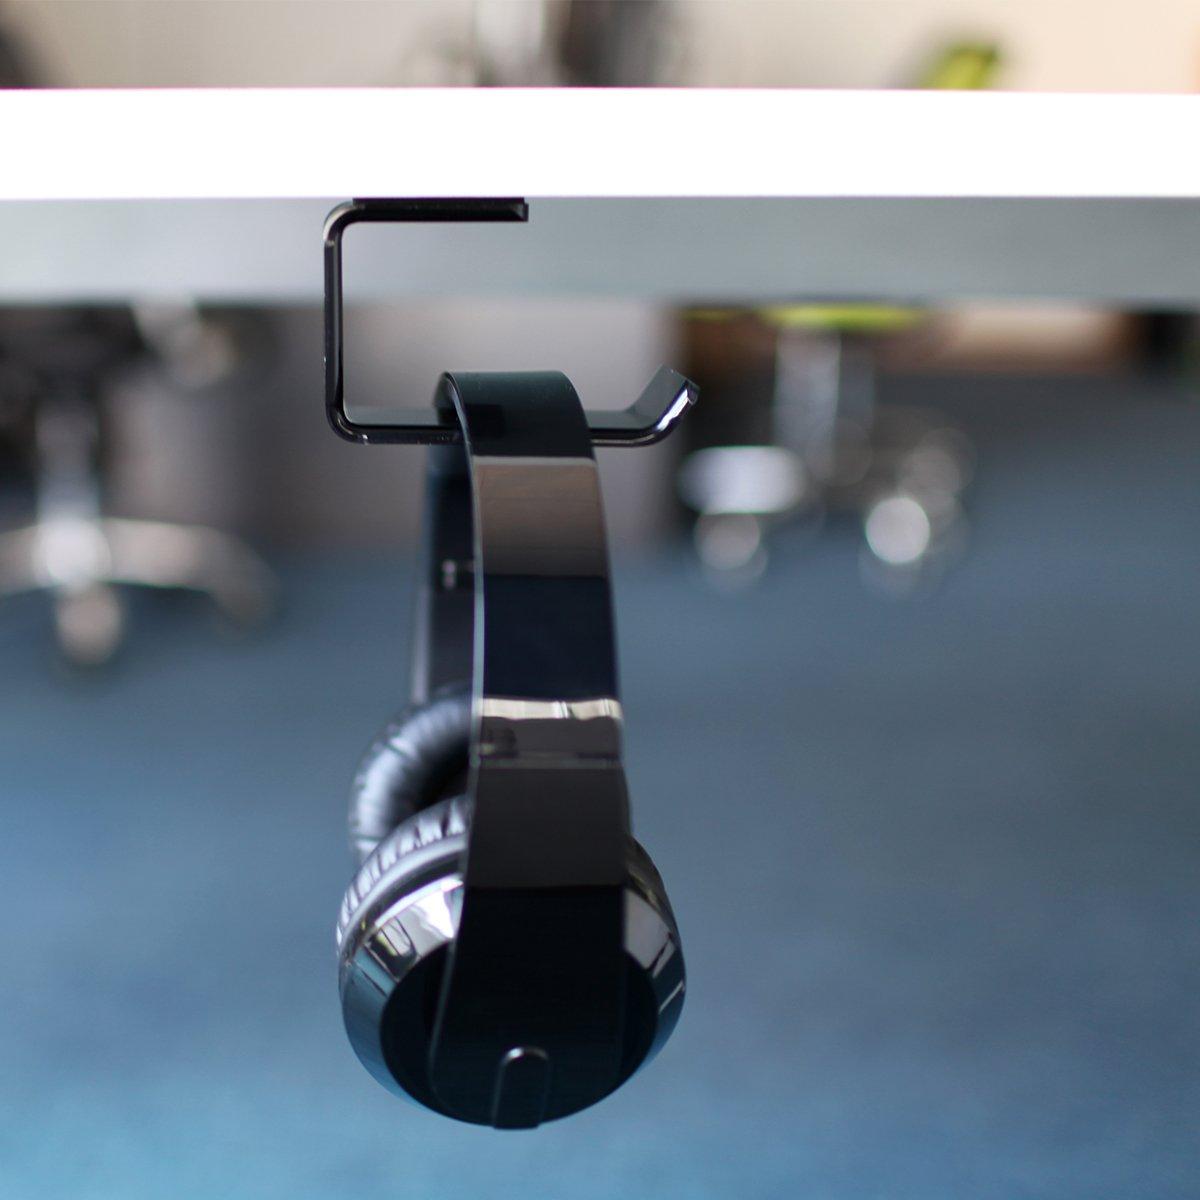 Headphone Hanger, AMOVEE Acrylic Under-Desk Stick-on Headphone Hanger 4330150034